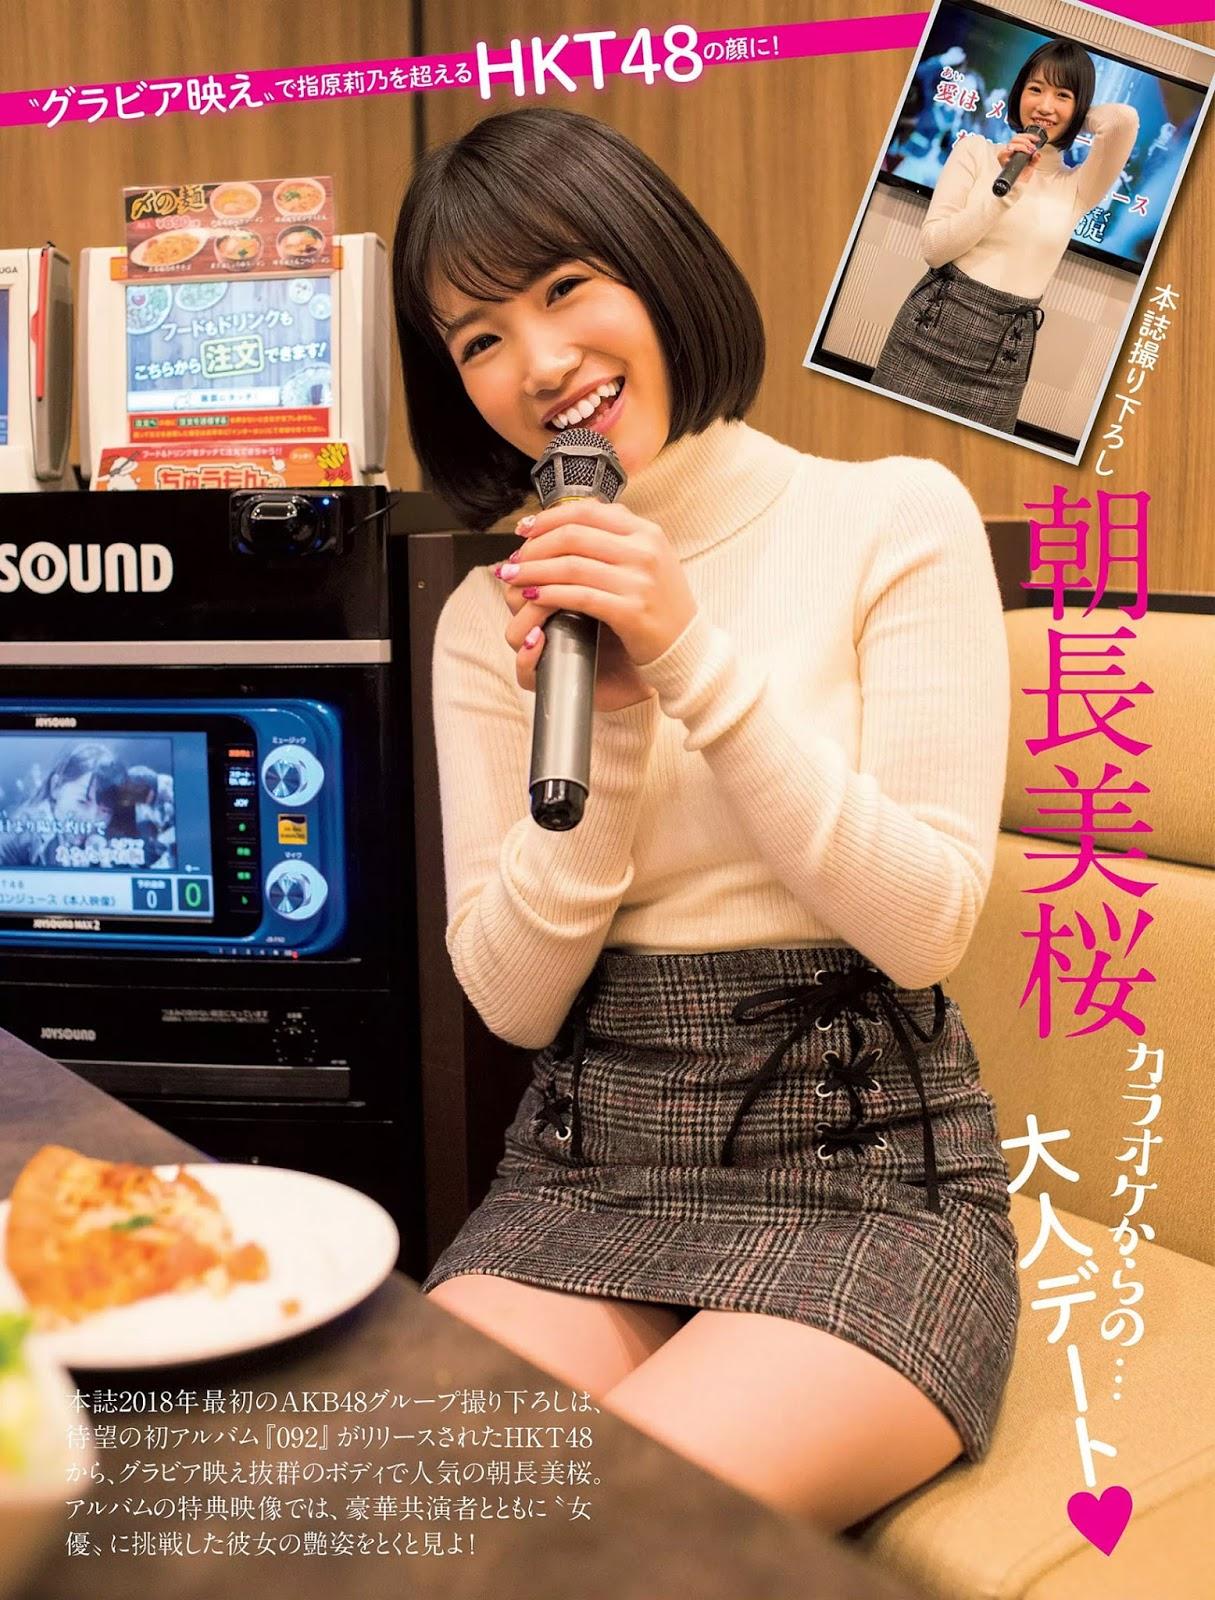 Tomonaga Mio 朝長美桜, FLASH 2018.01.16 (フラッシュ 2018年01月16日号)